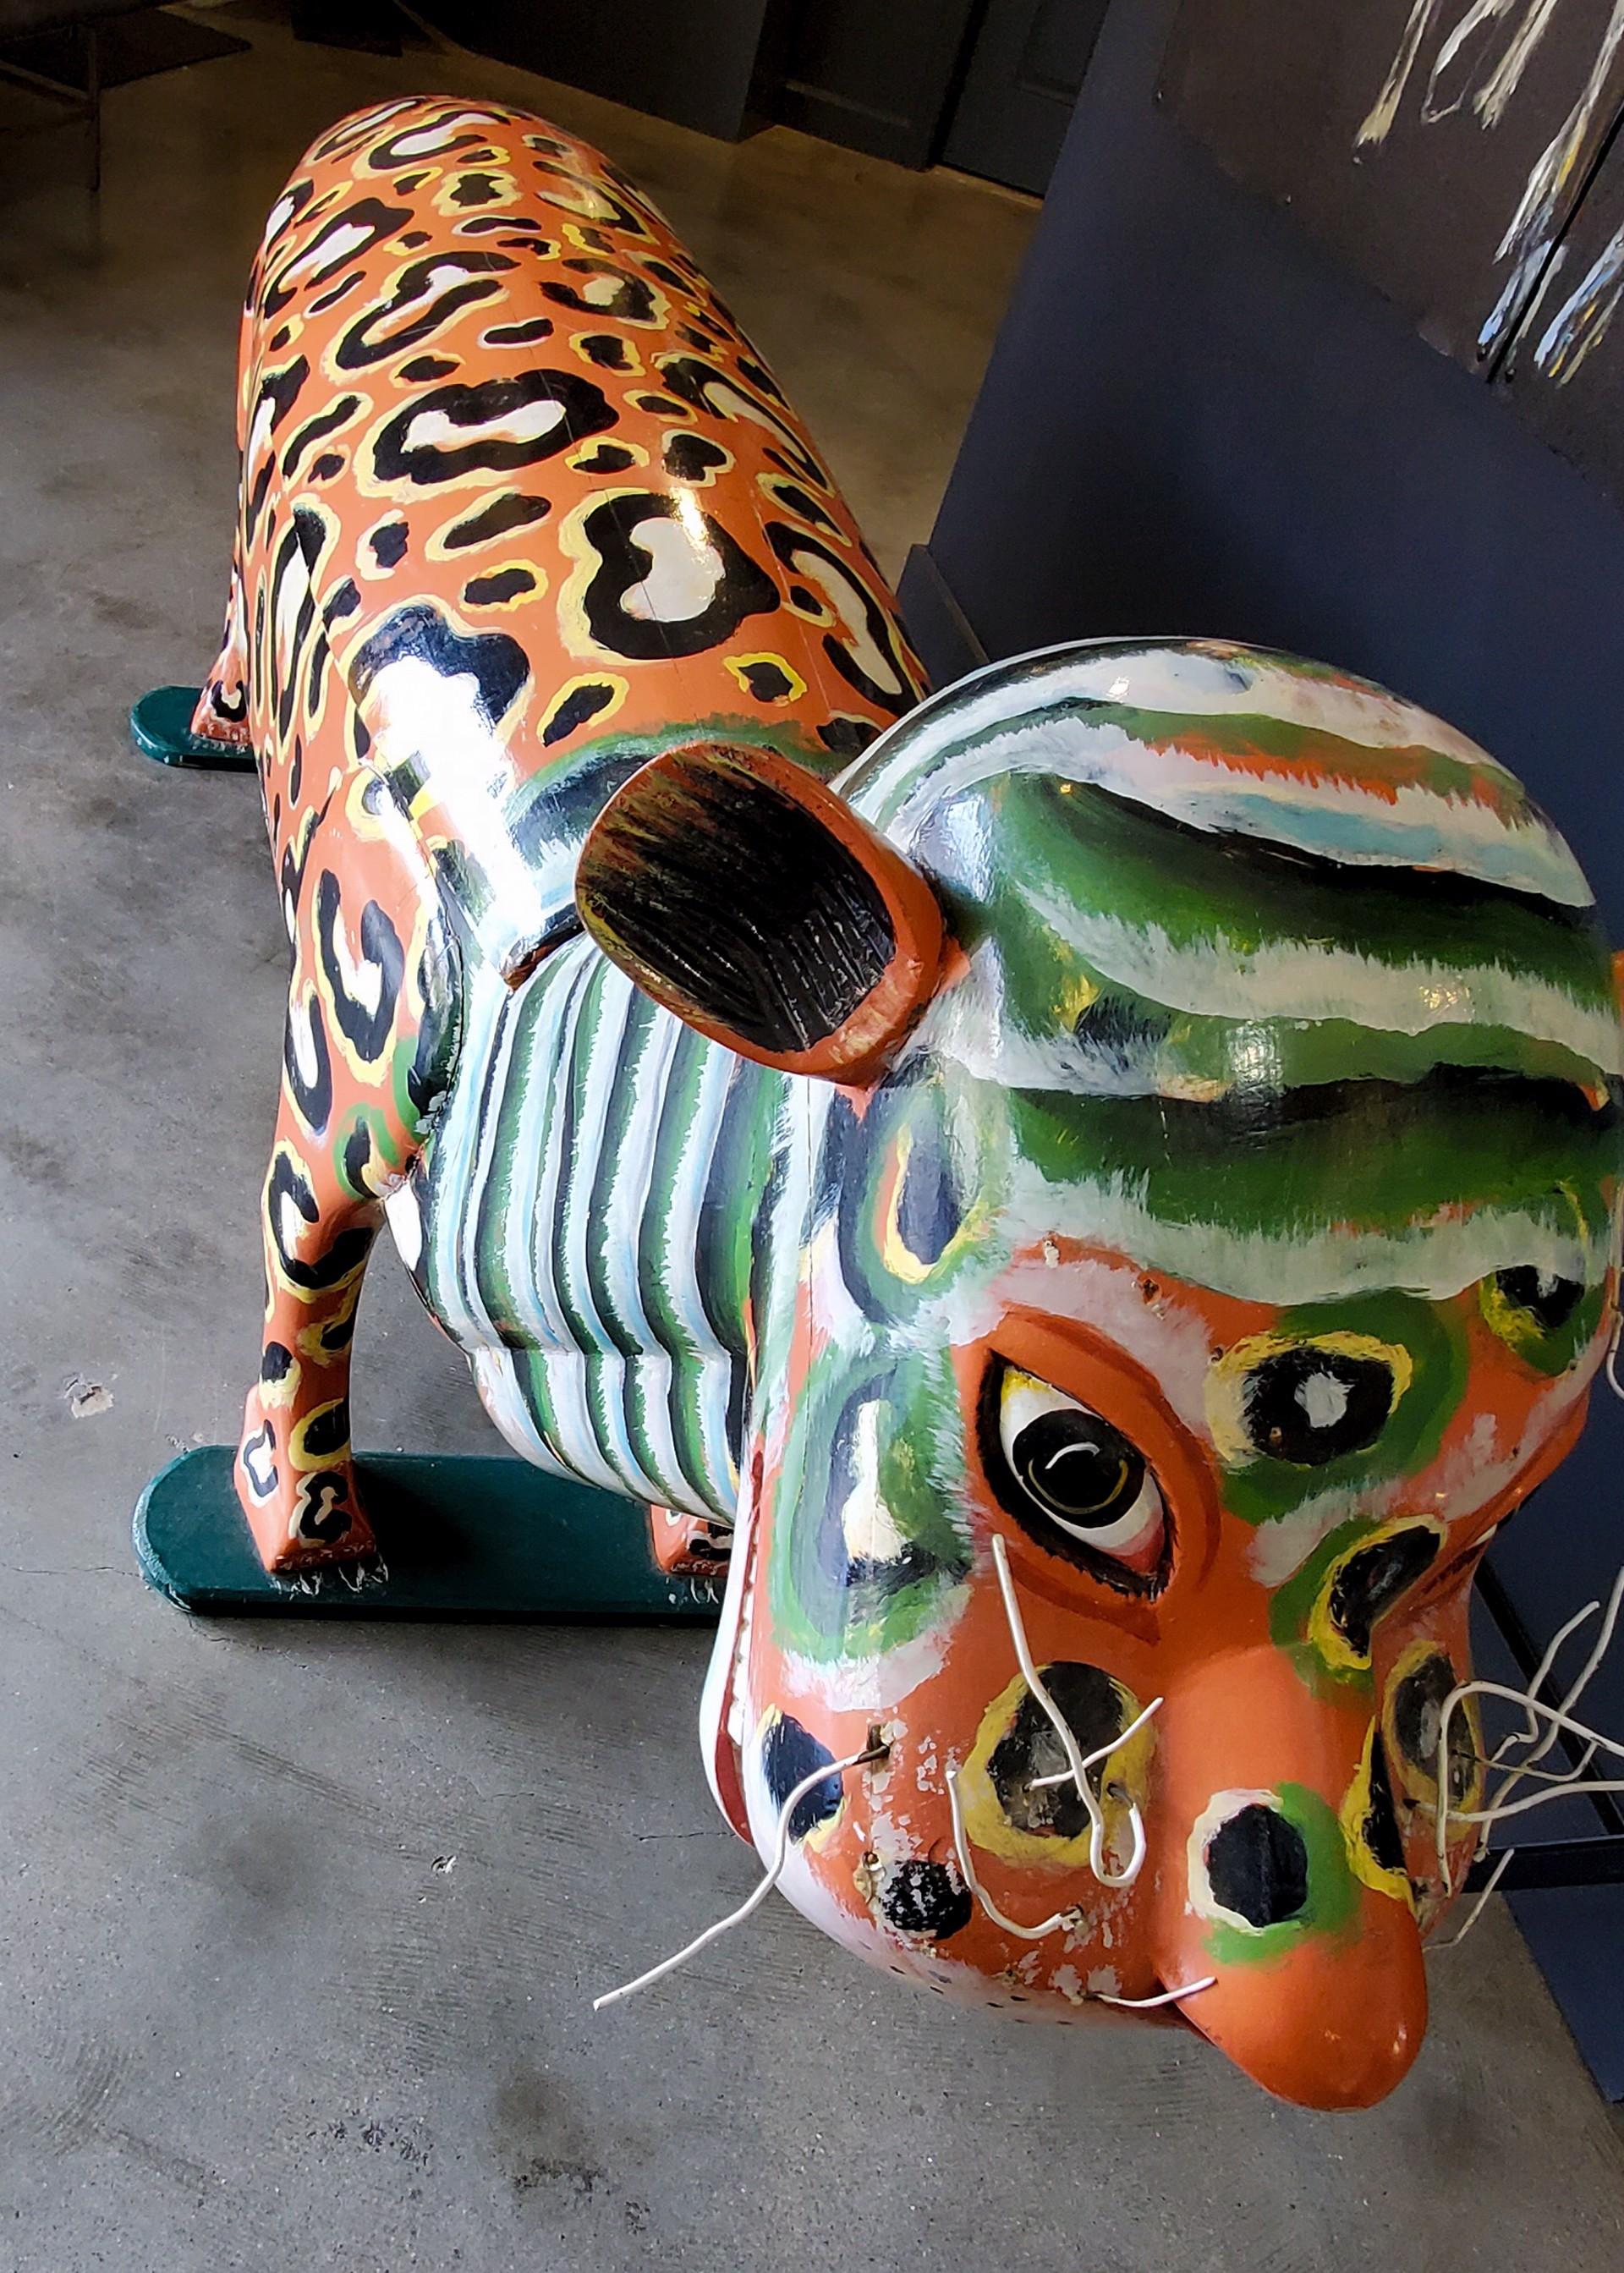 Tiger - Coffin by Paa Joe